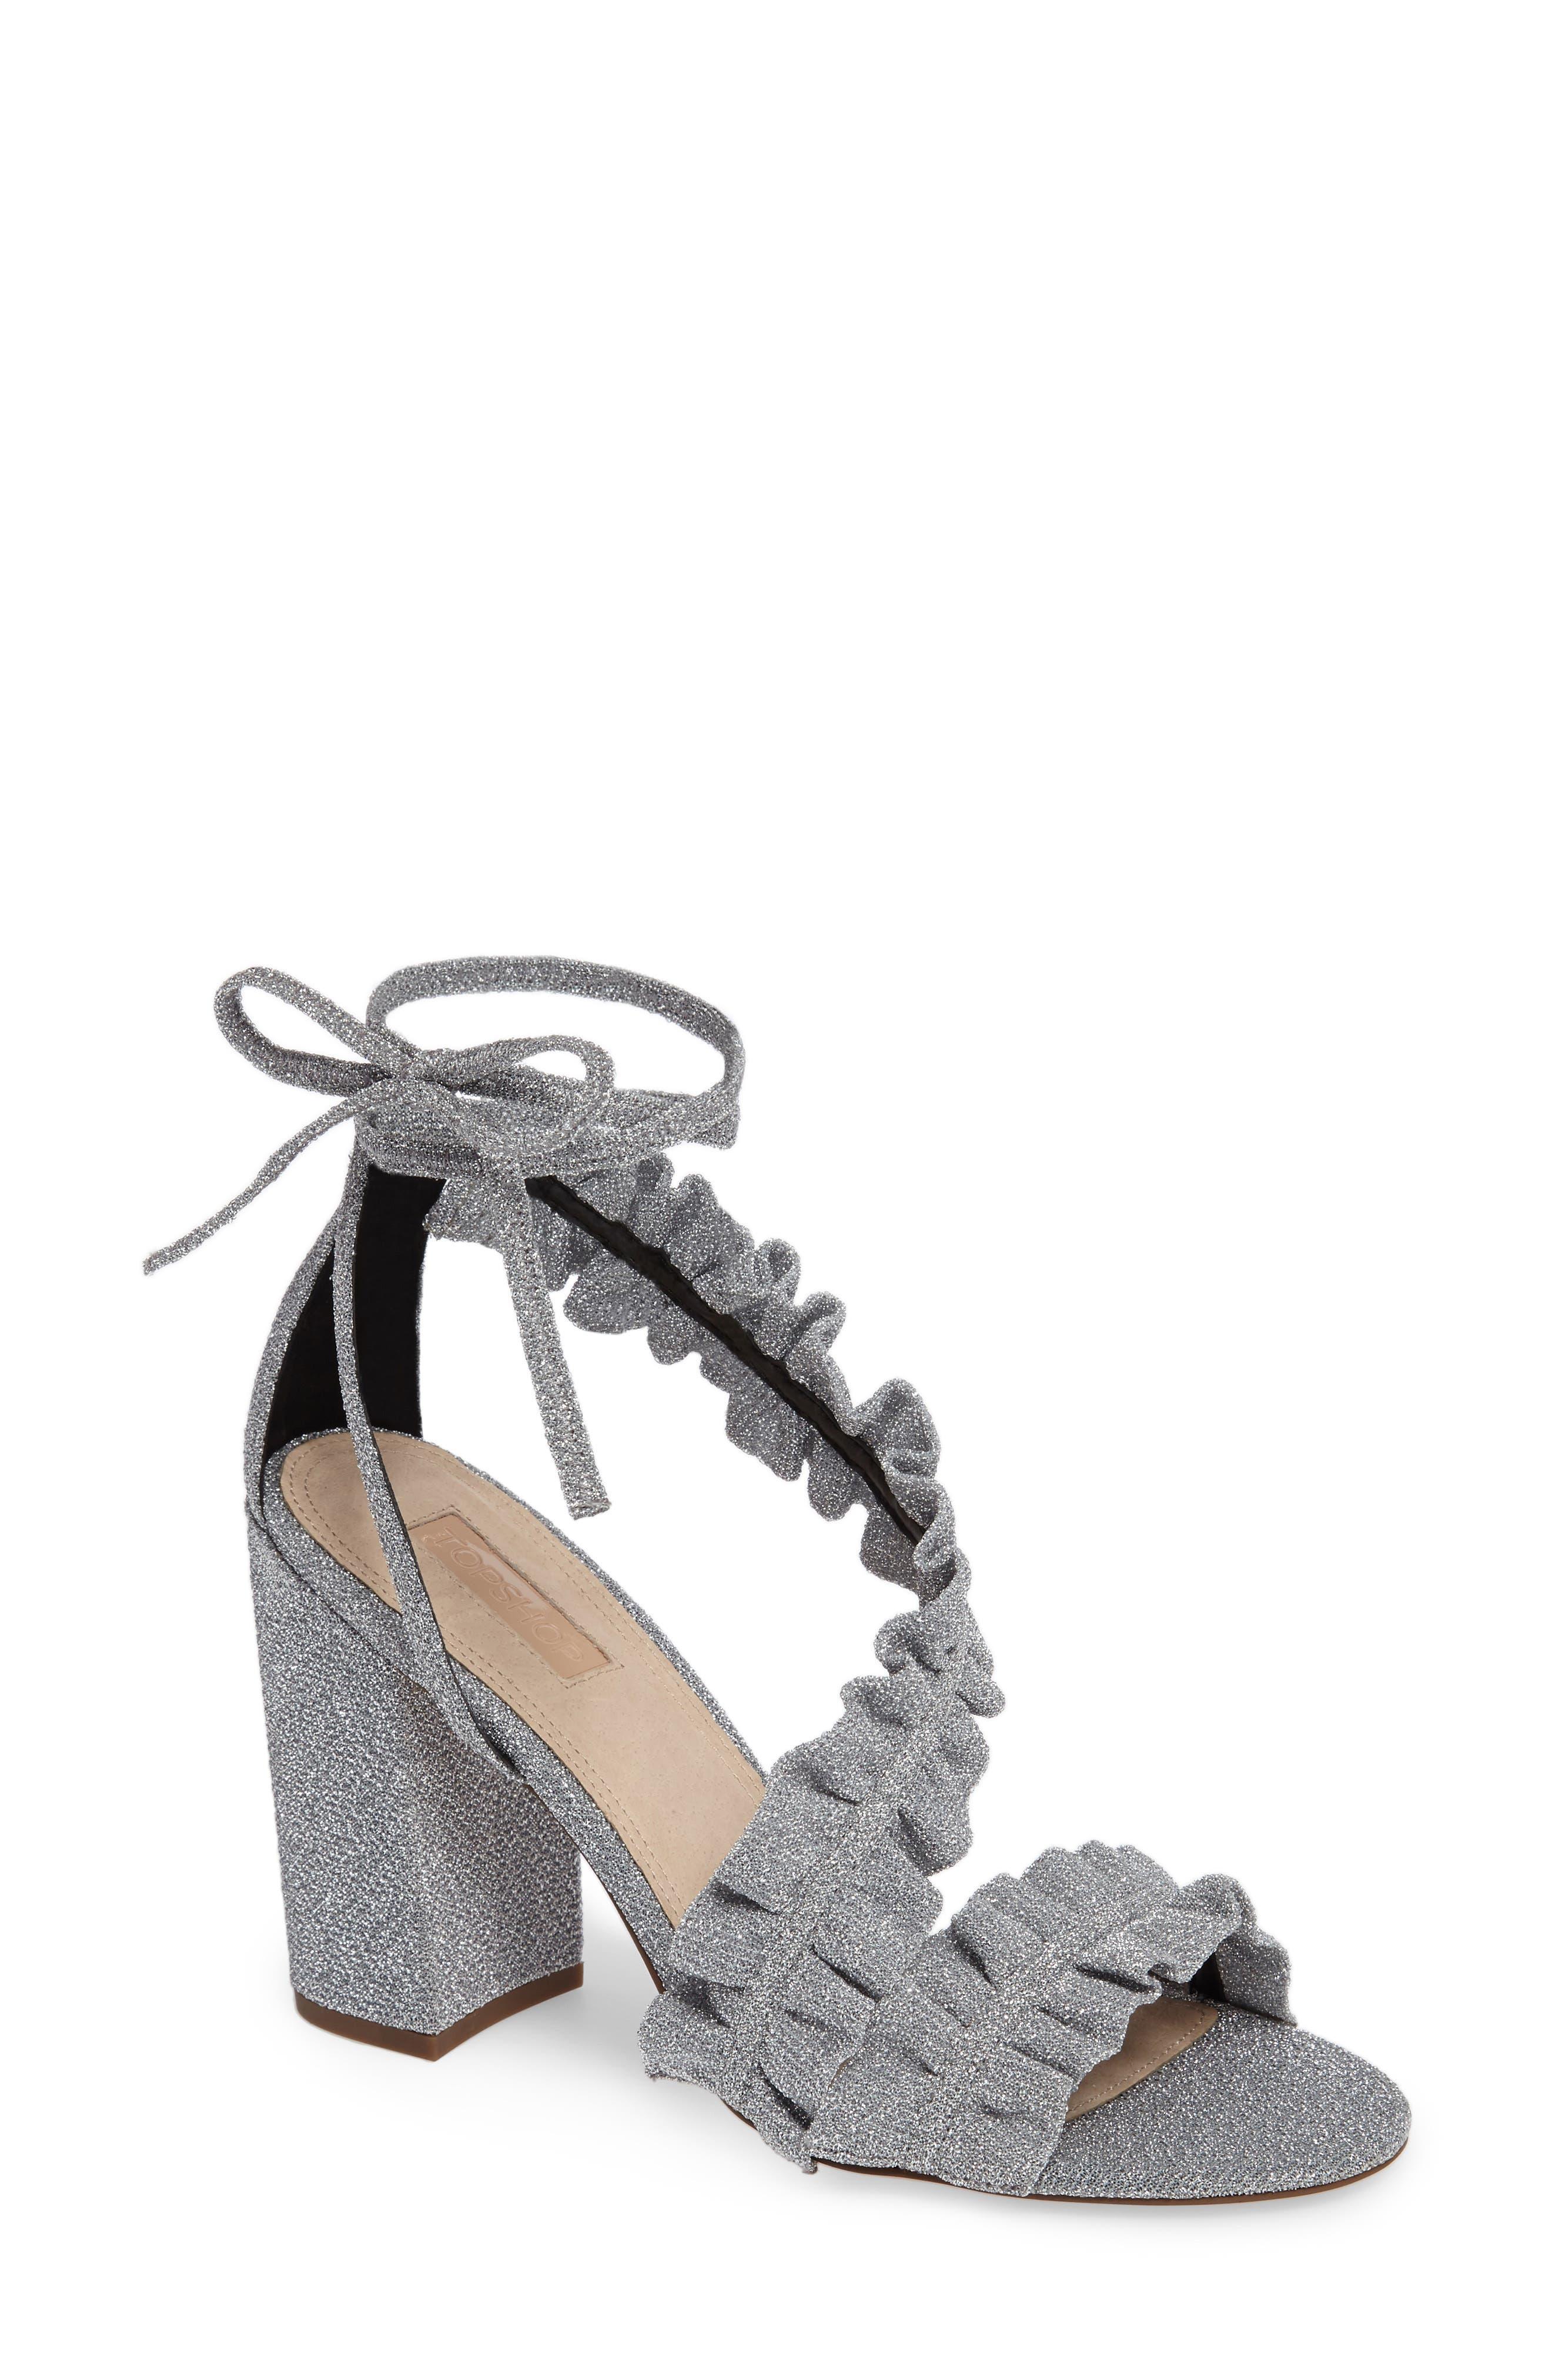 Alternate Image 1 Selected - Topshop Real Asymmetrical Ruffled Sandal (Women)